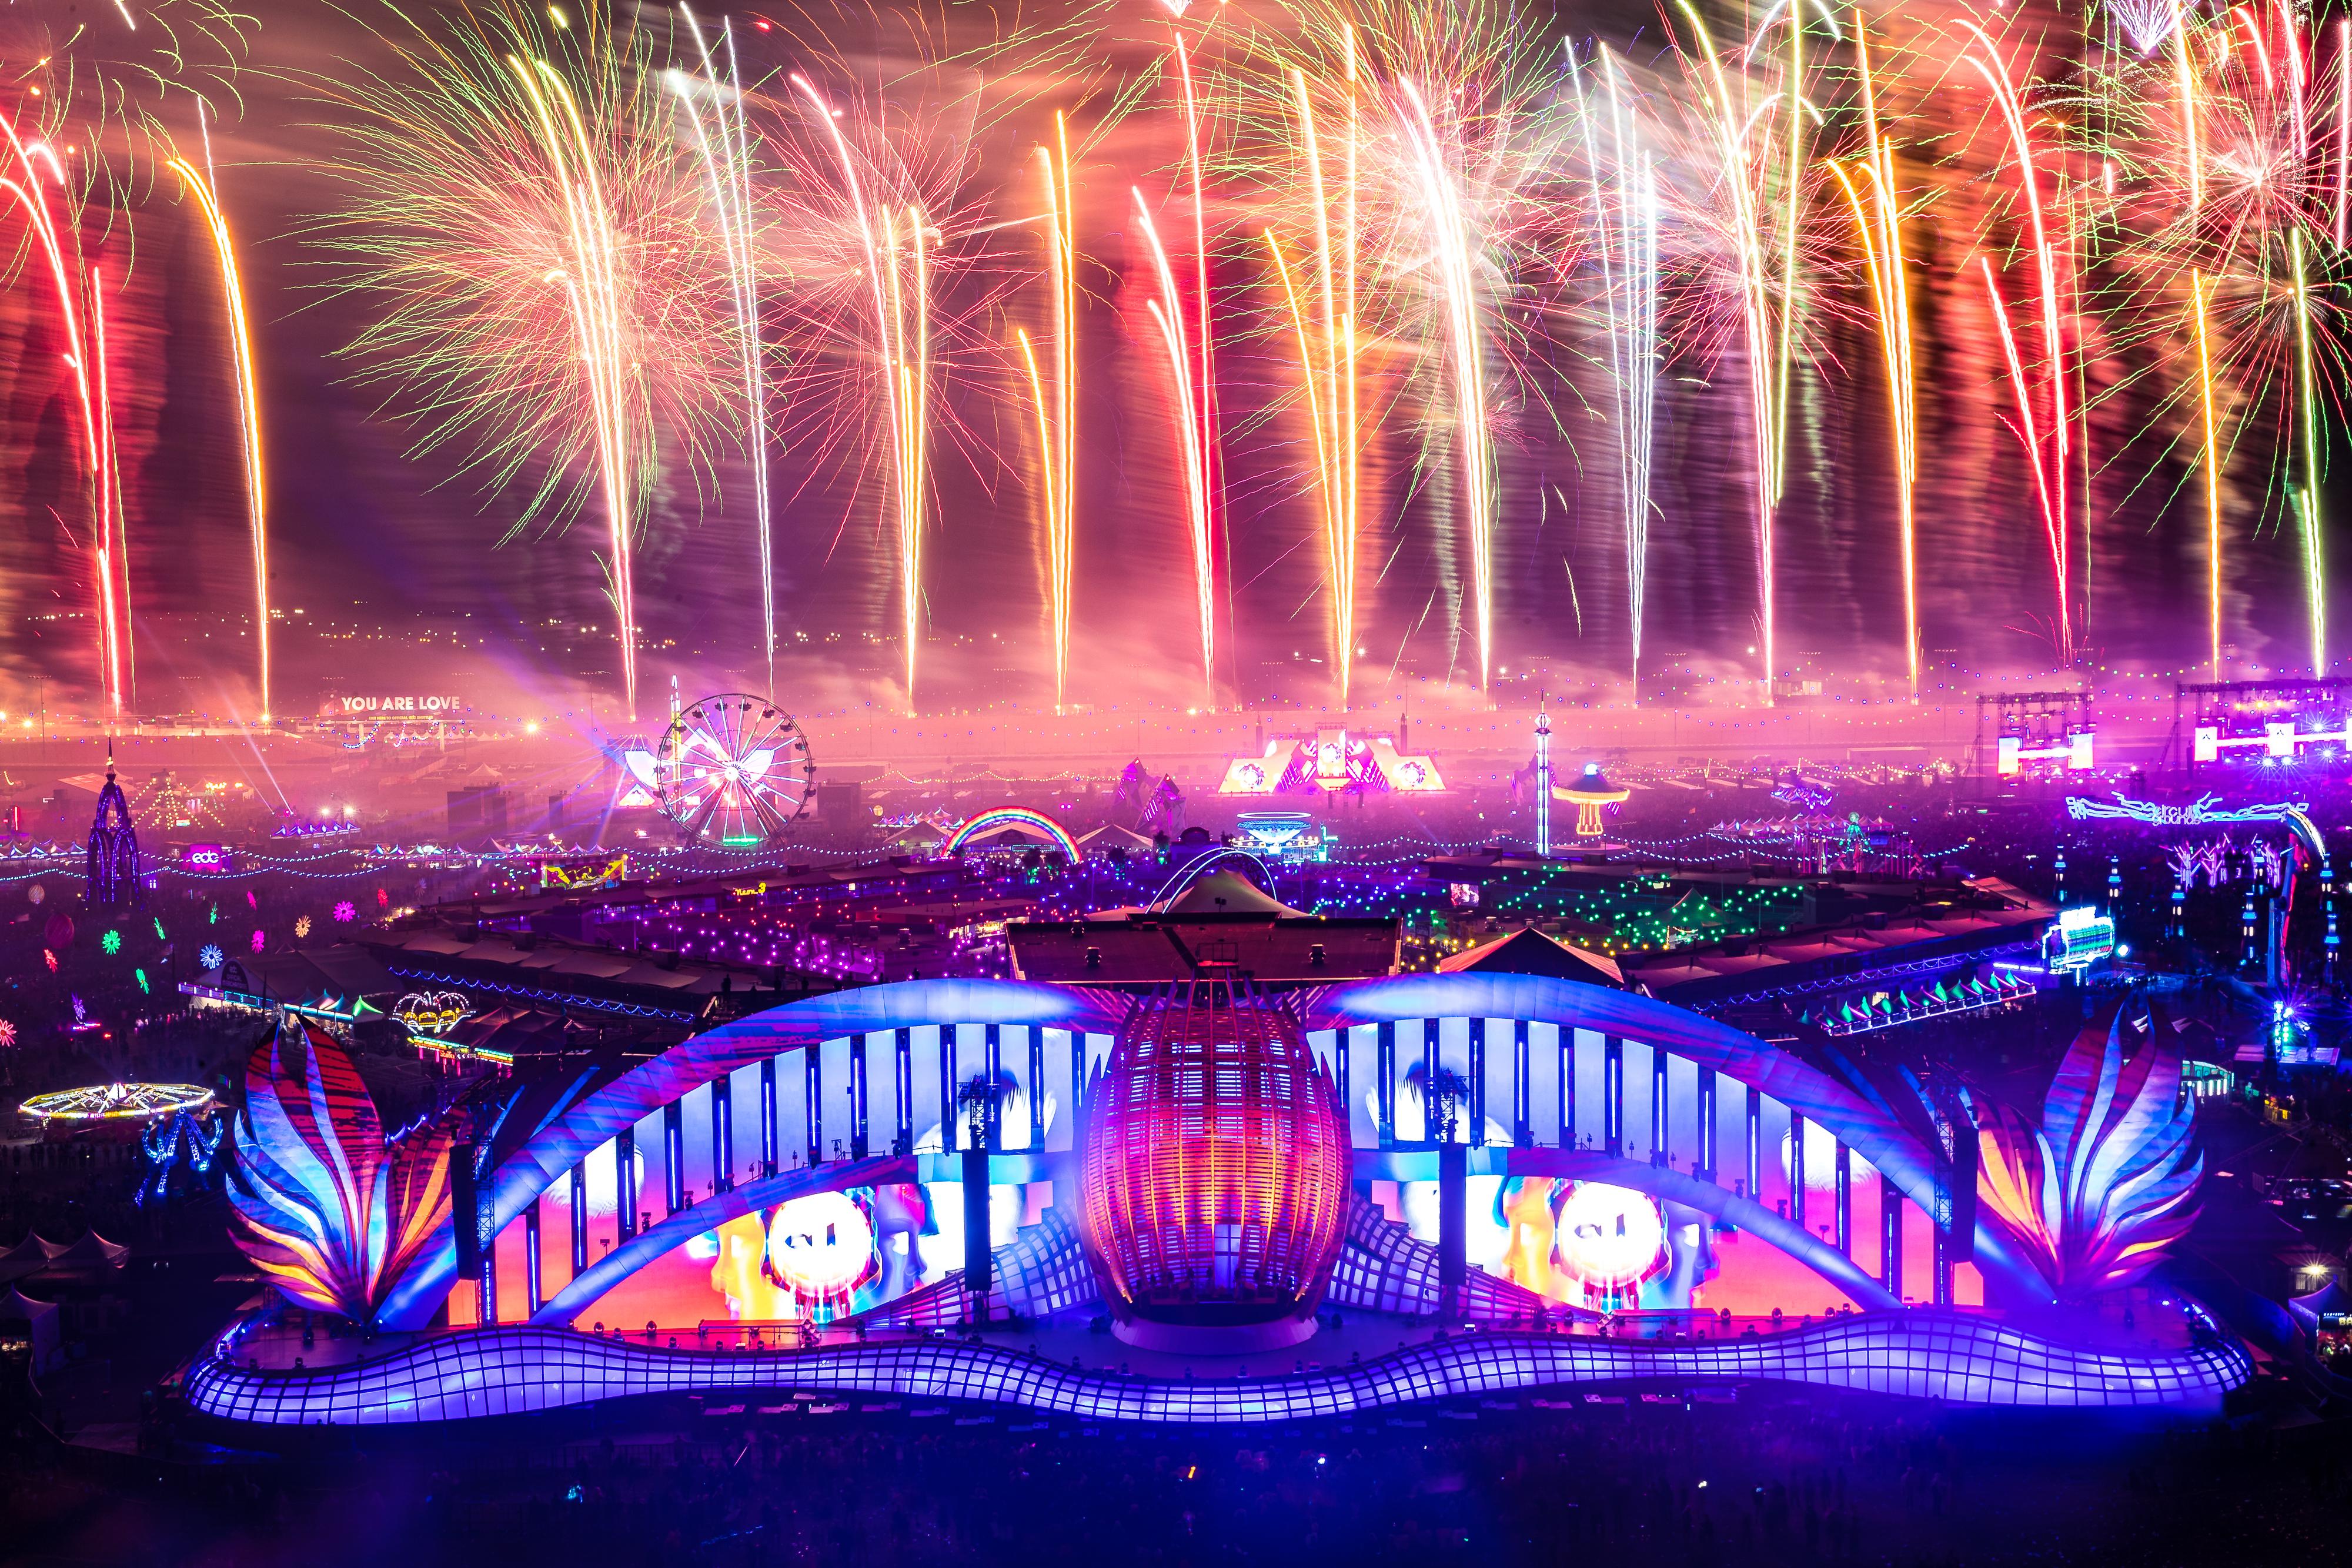 Edc 2020 Schedule EDC Las Vegas Announces Dates For 2020 Festival